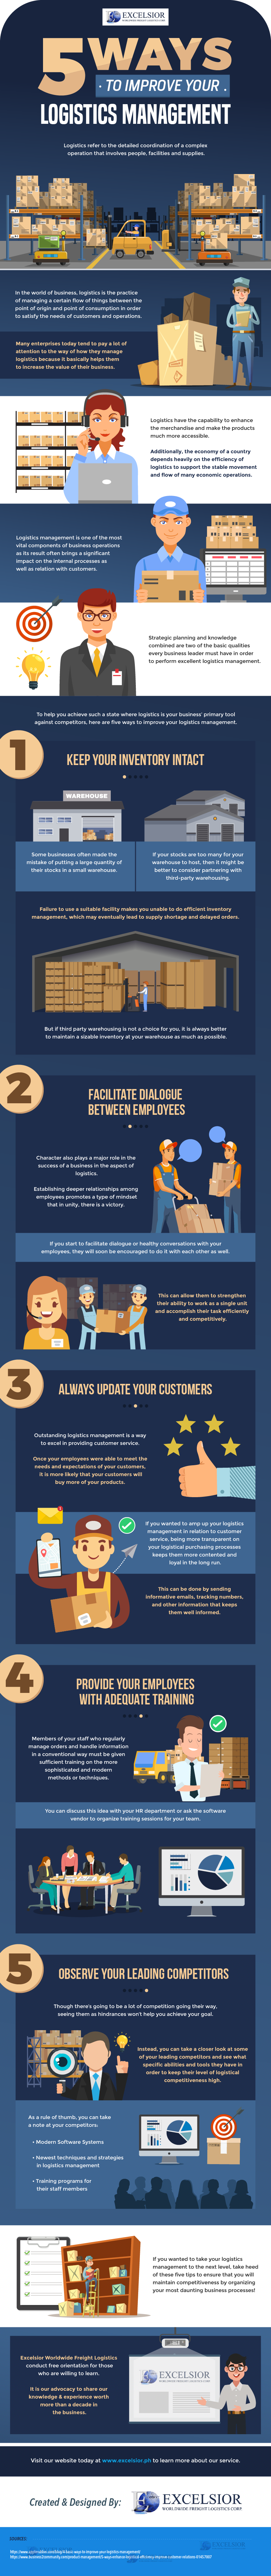 5 Ways to Improve Your Logistics Management - Infographic